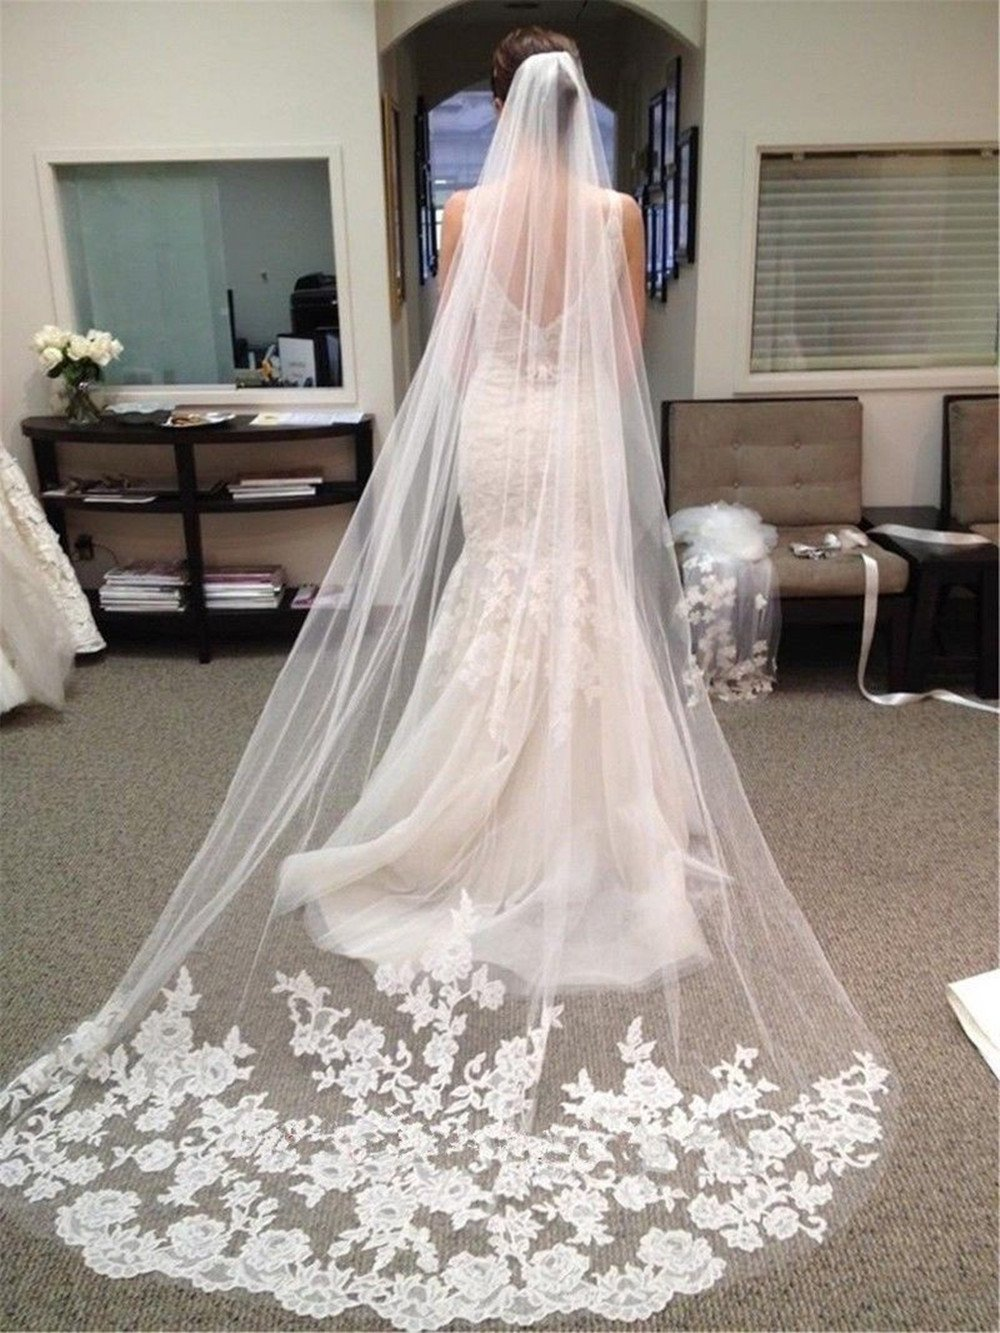 Ivory Velo de Novia de una Sola Capa Lianshi Bridal Veil Encaje Bordado Novia Suministros 3m